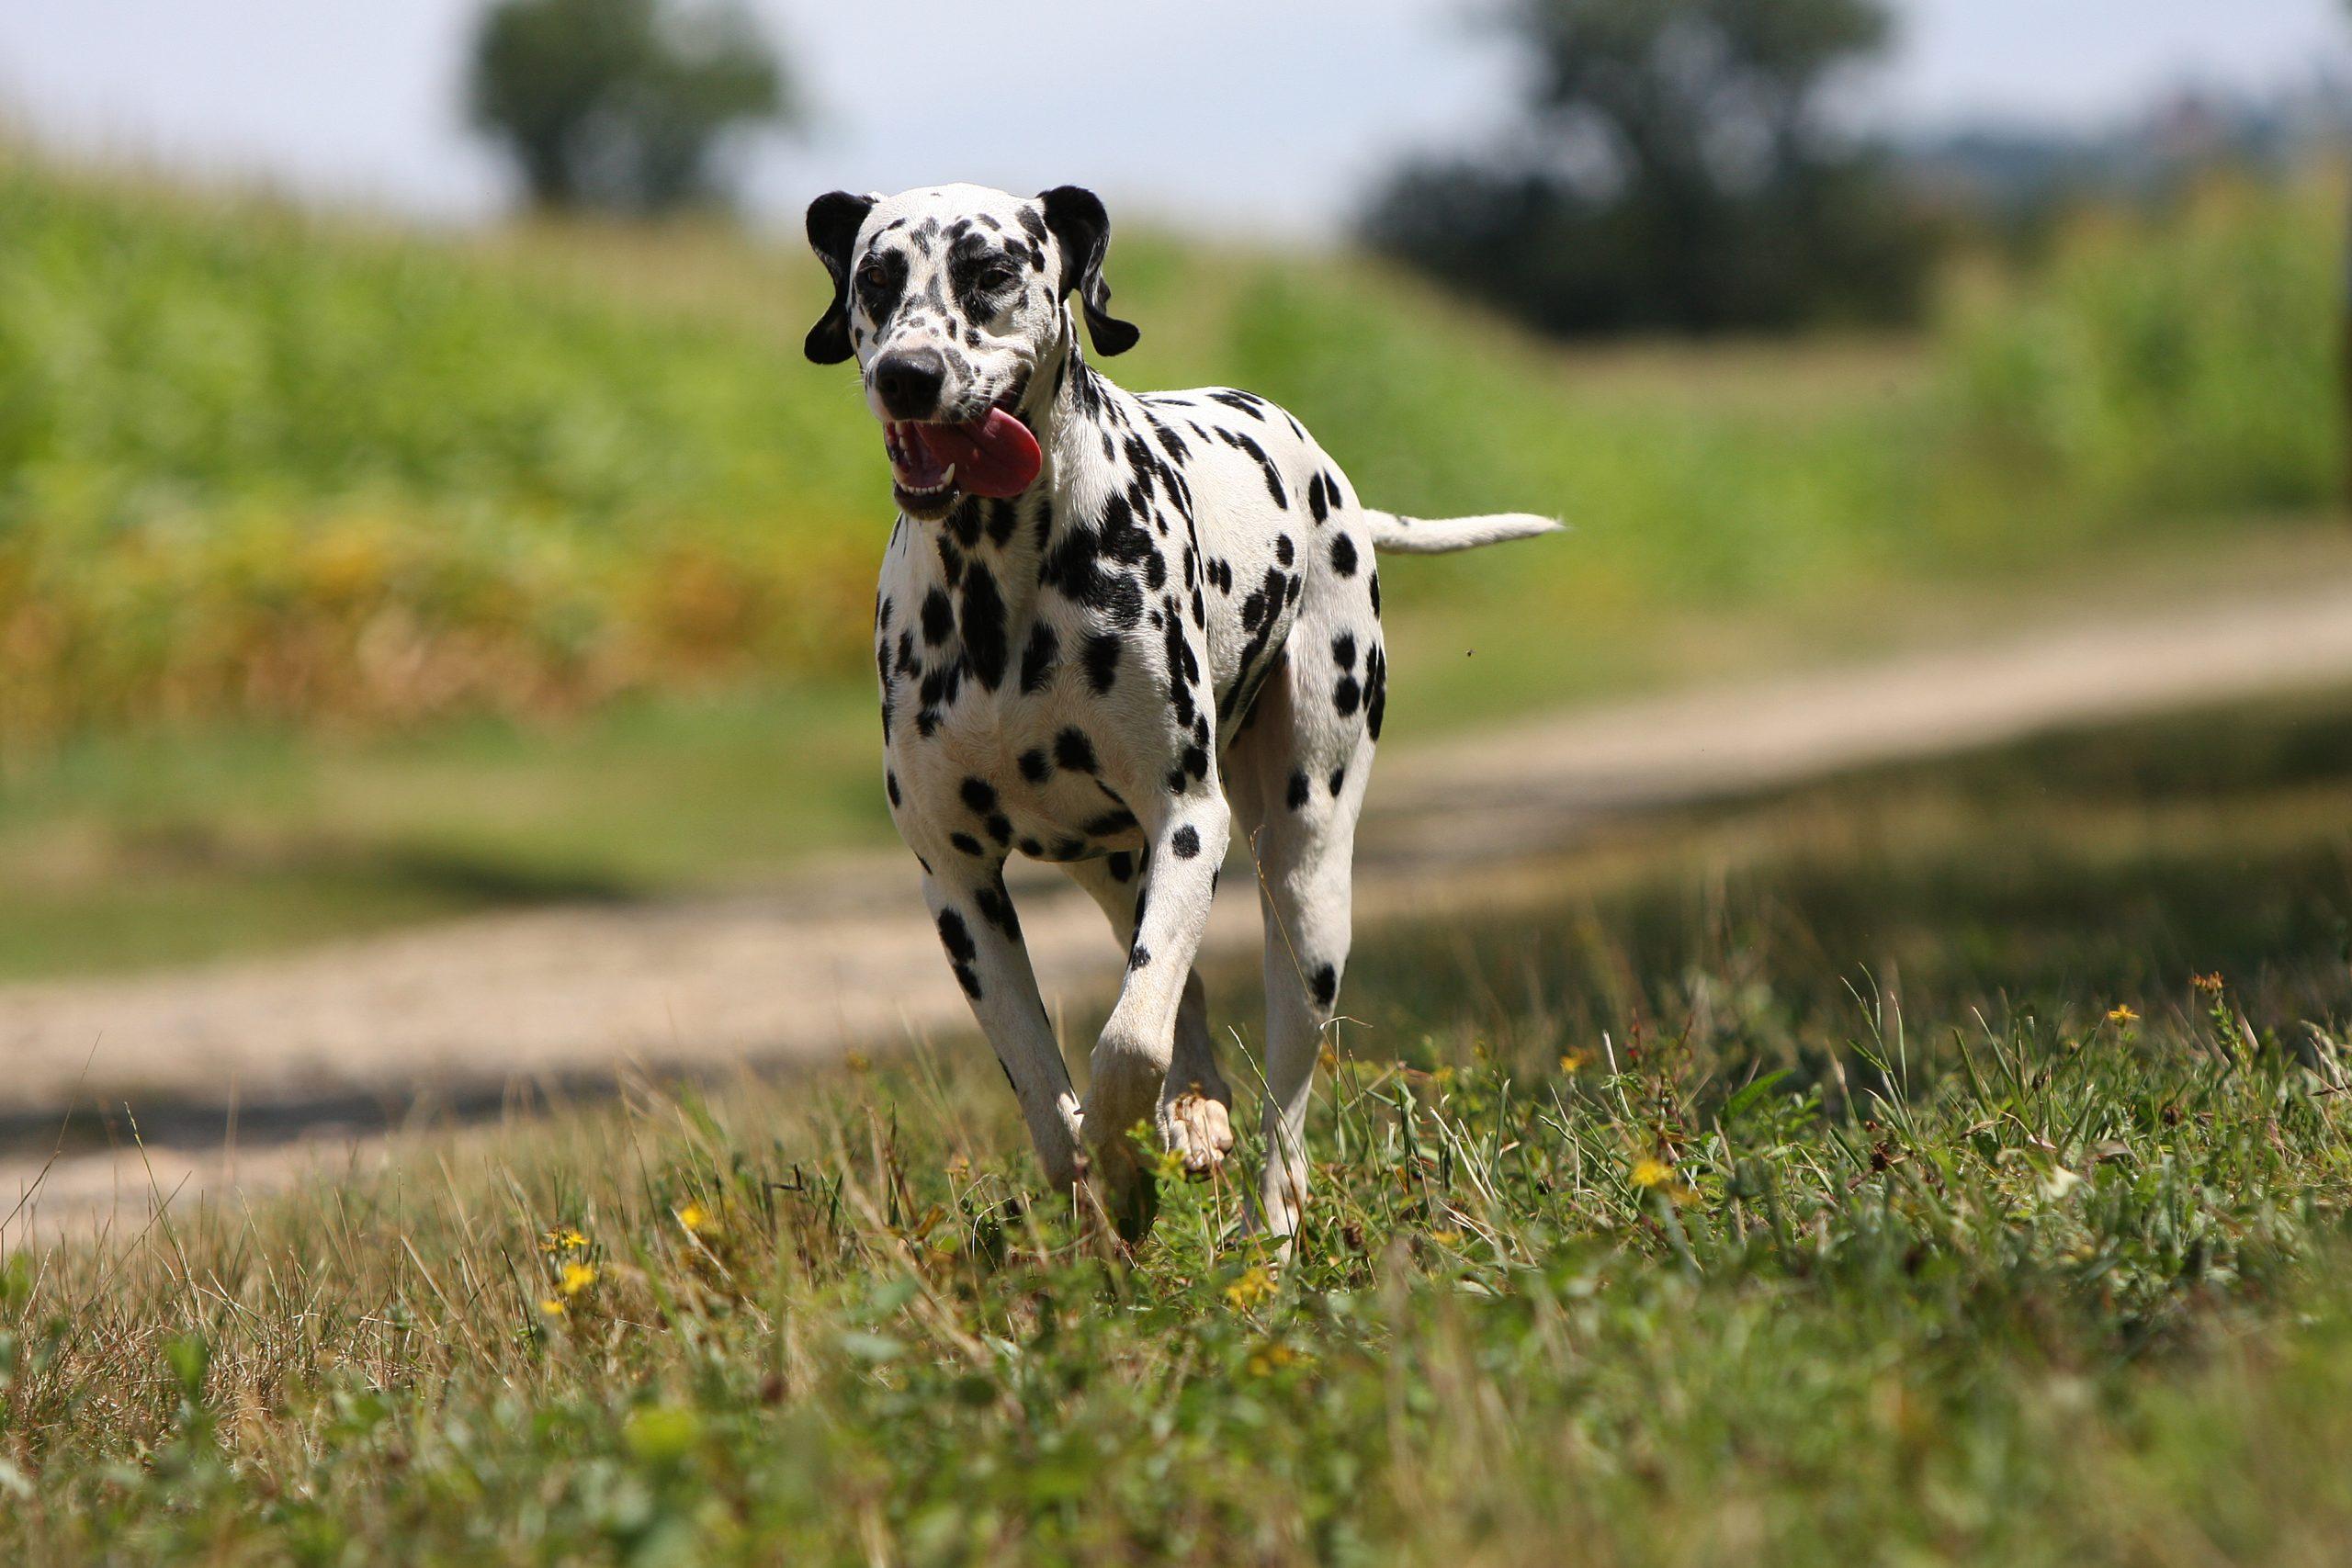 A Dalmatian running through an open field representing how Caledonia pet microchip identification can help keep you pet safe.